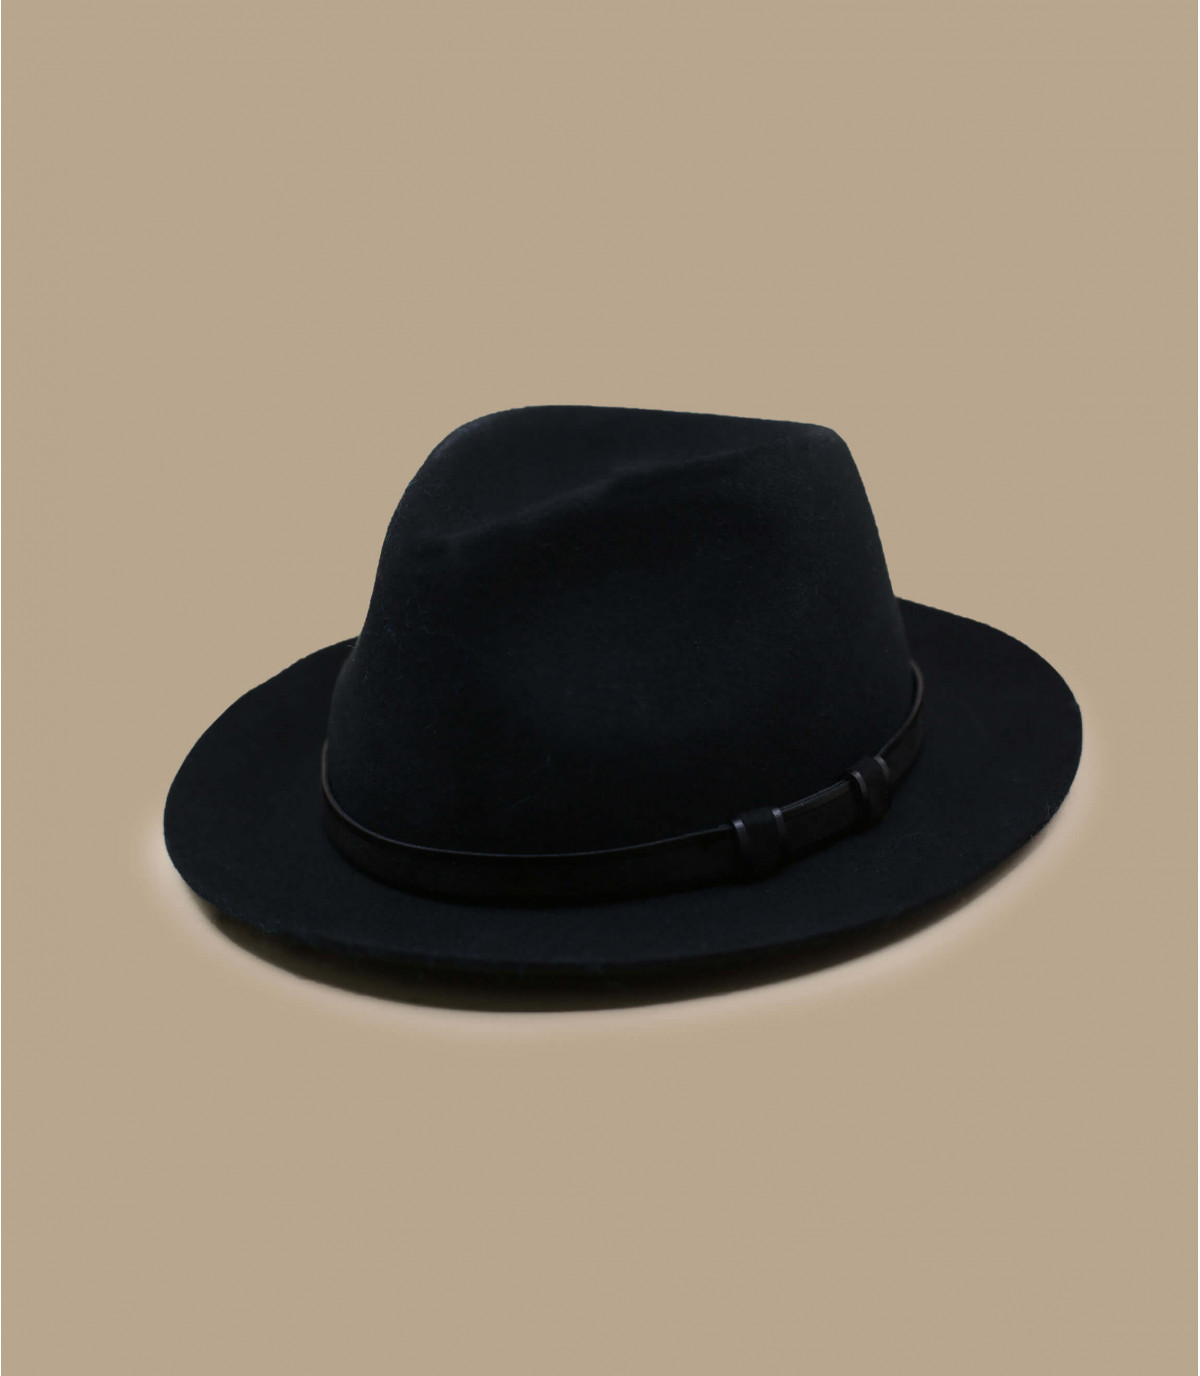 lana nera federata